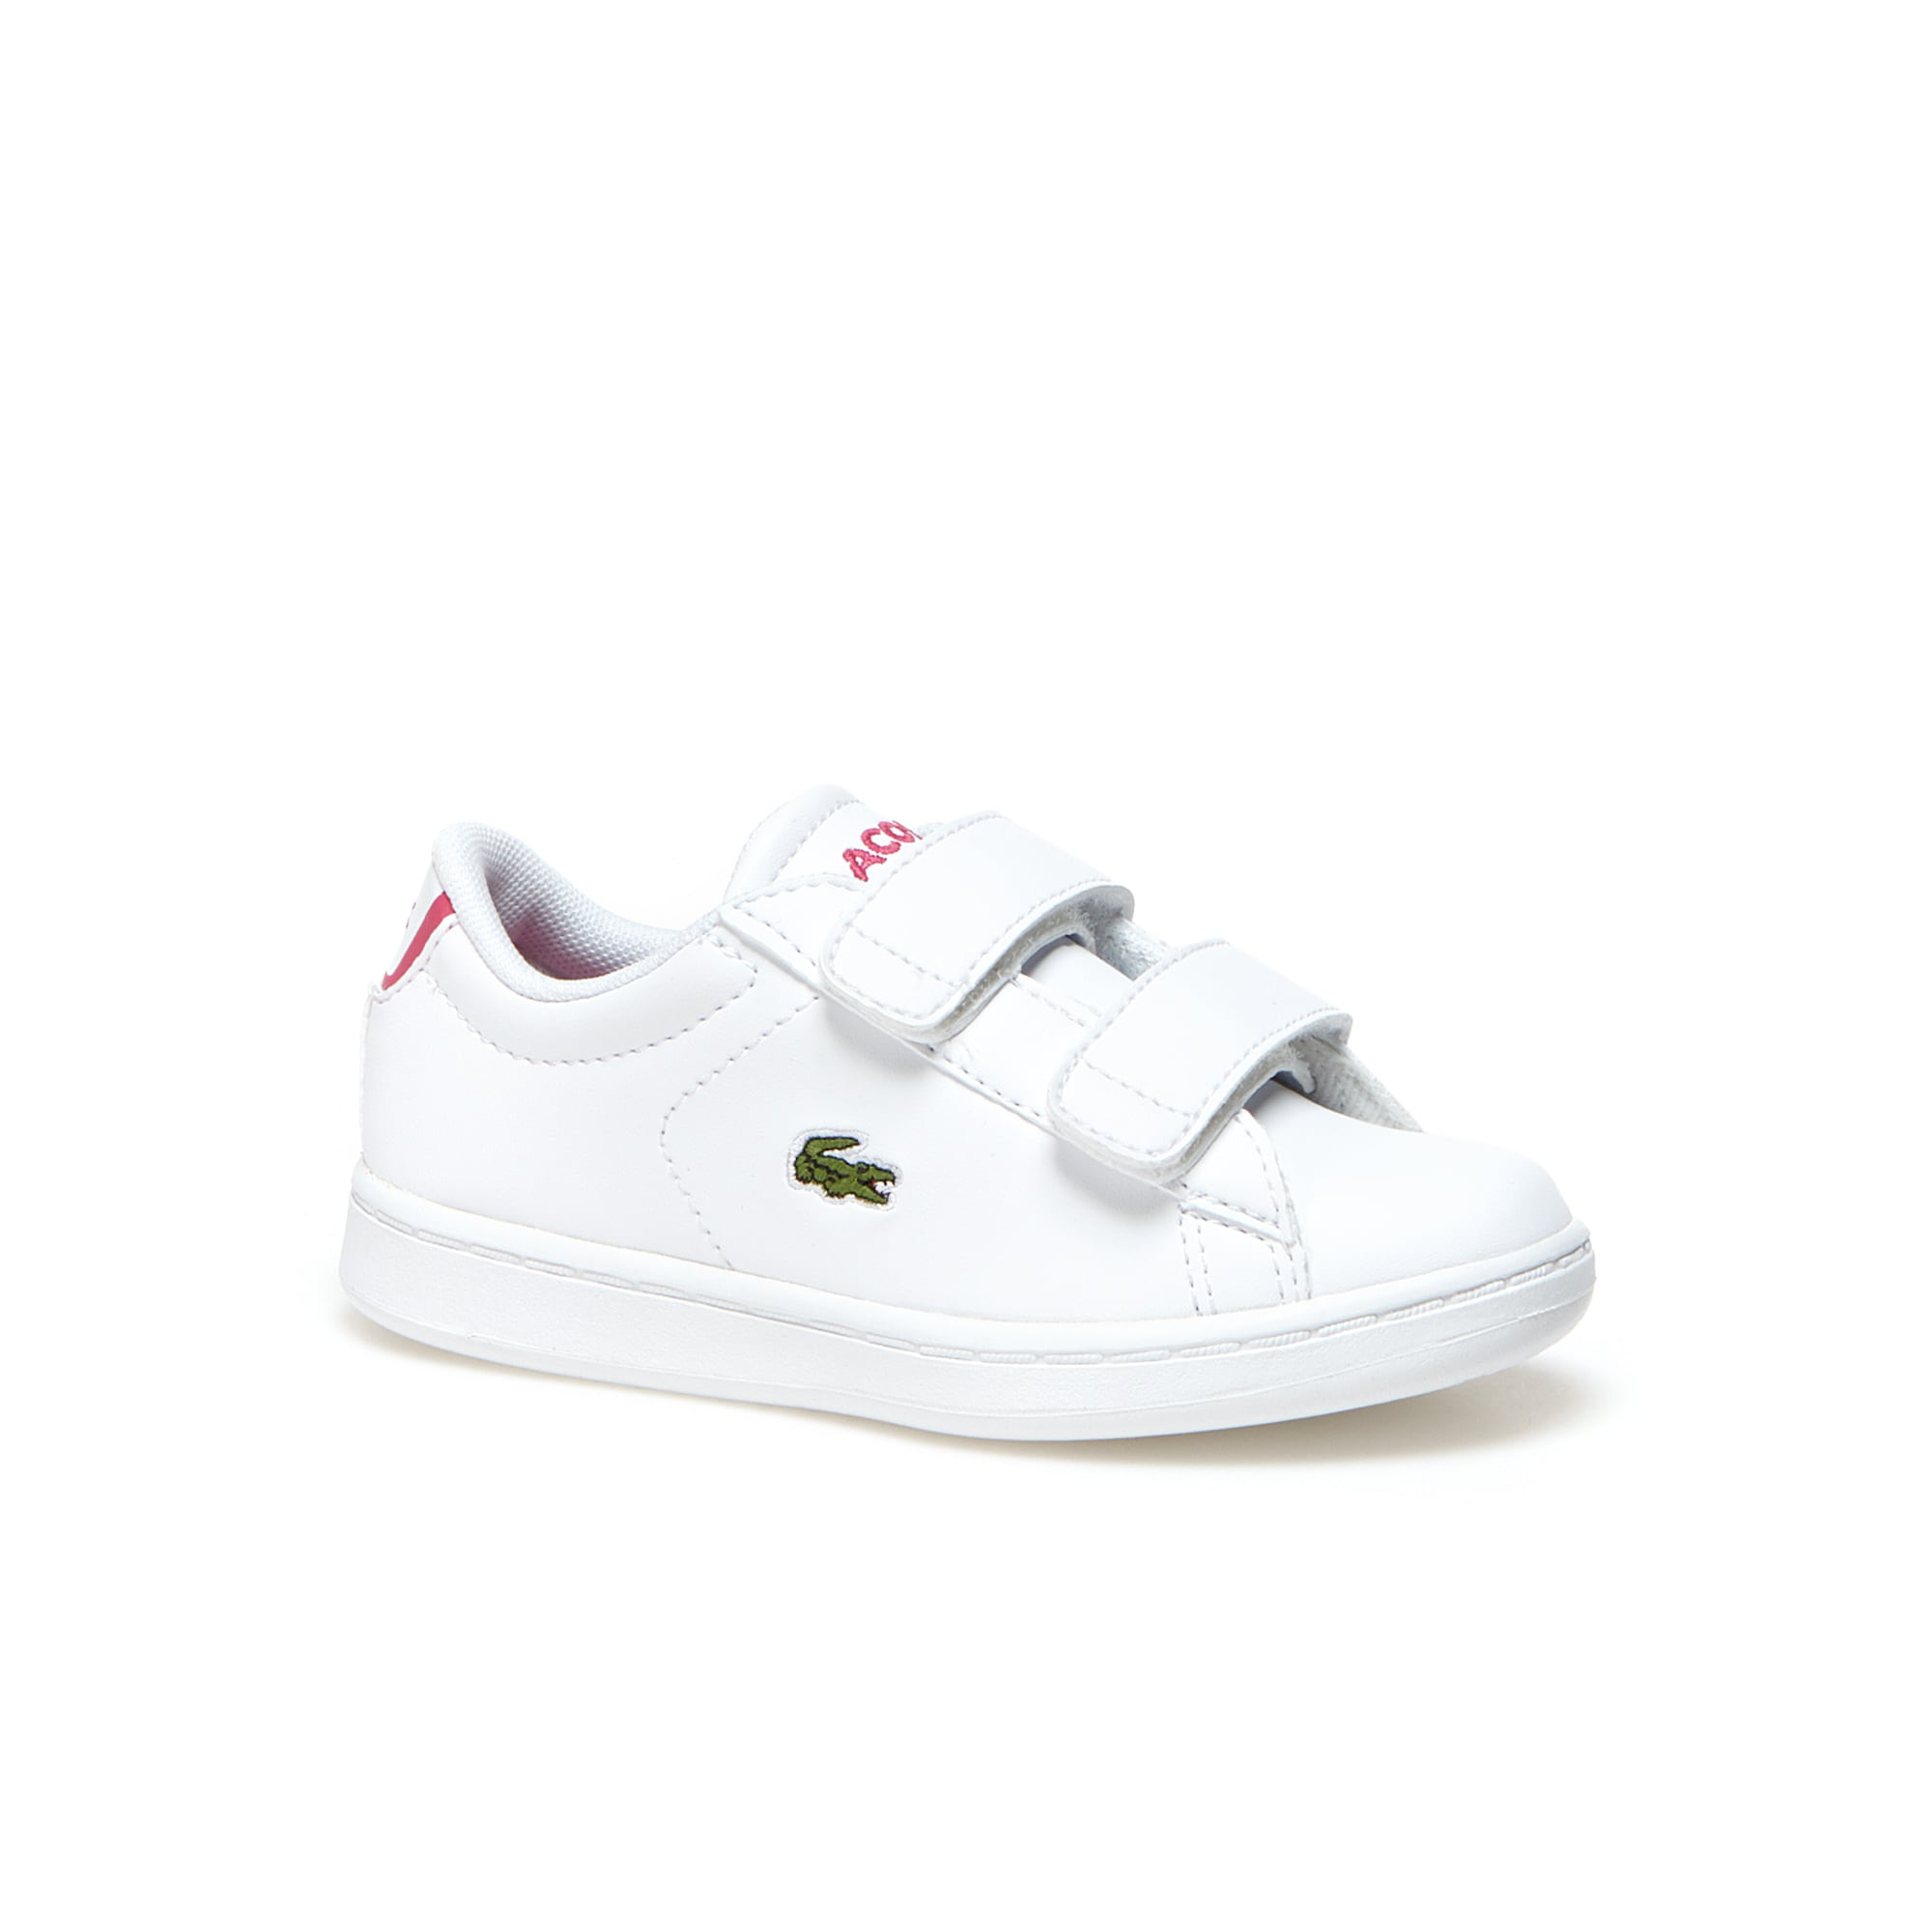 Sneakers da bambino Carnaby Evo con chiusura rapida